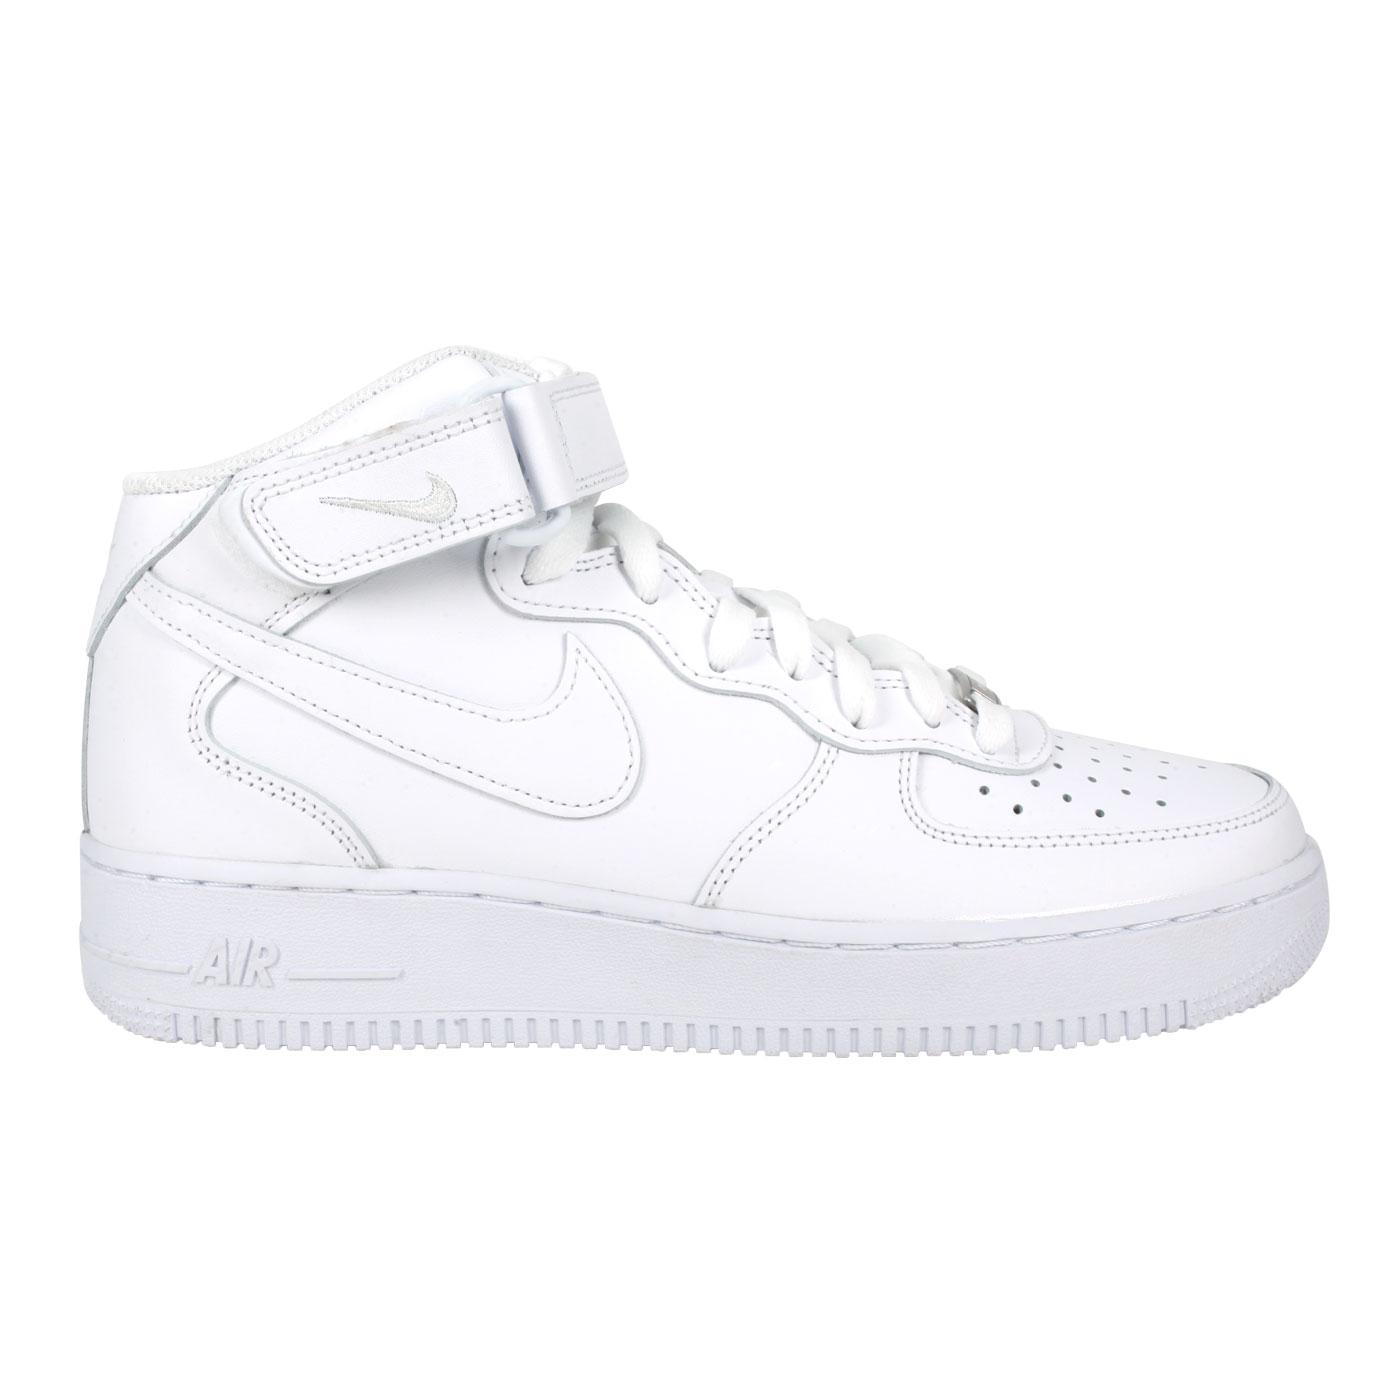 NIKE 男款休閒鞋  @AIR FORCE 1 MID '07@CW2289111